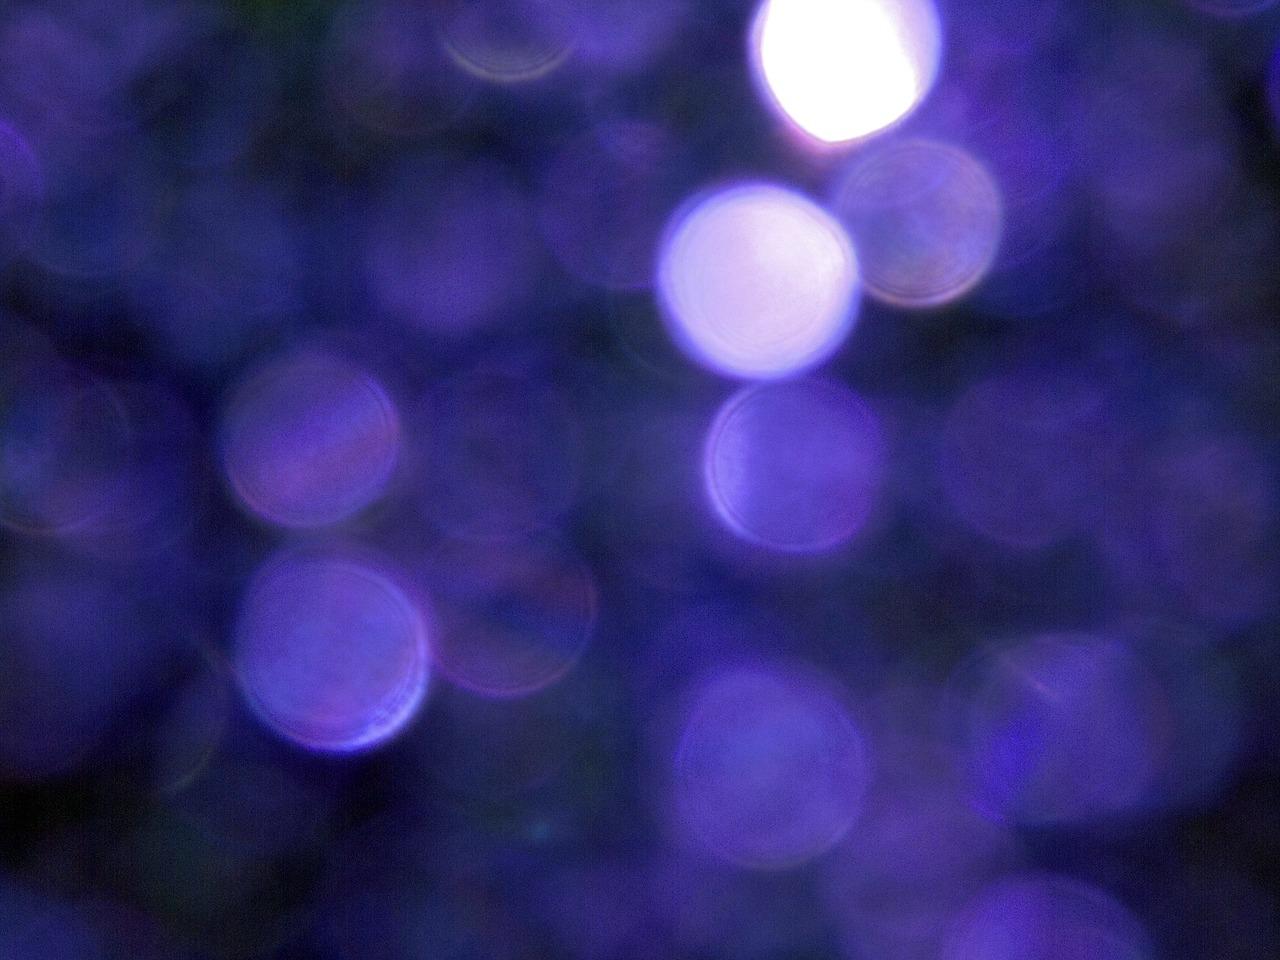 Gems of Wisdom-Purple songs can fly